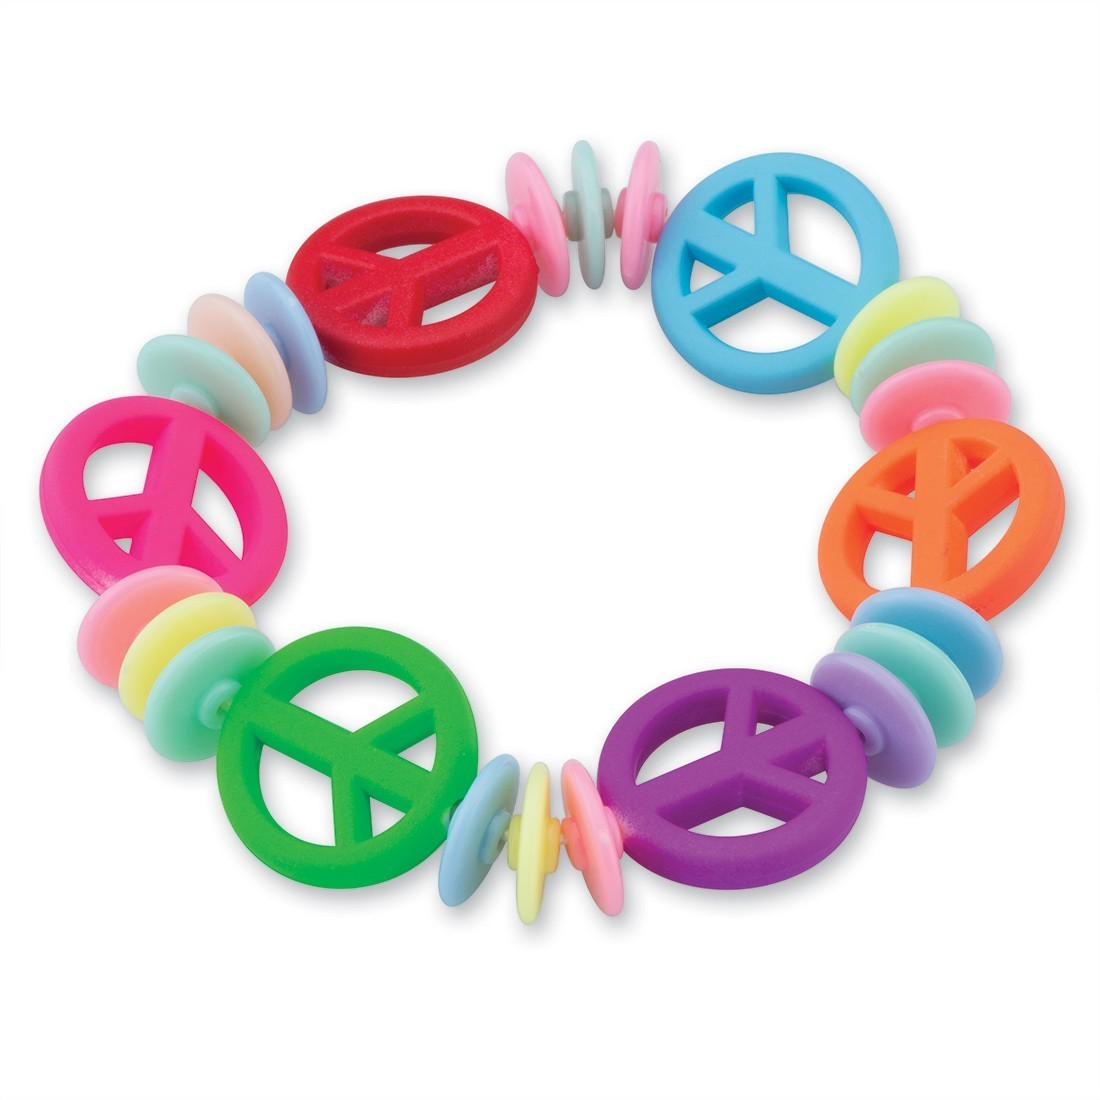 Peace Sign Bead Bracelets [image]